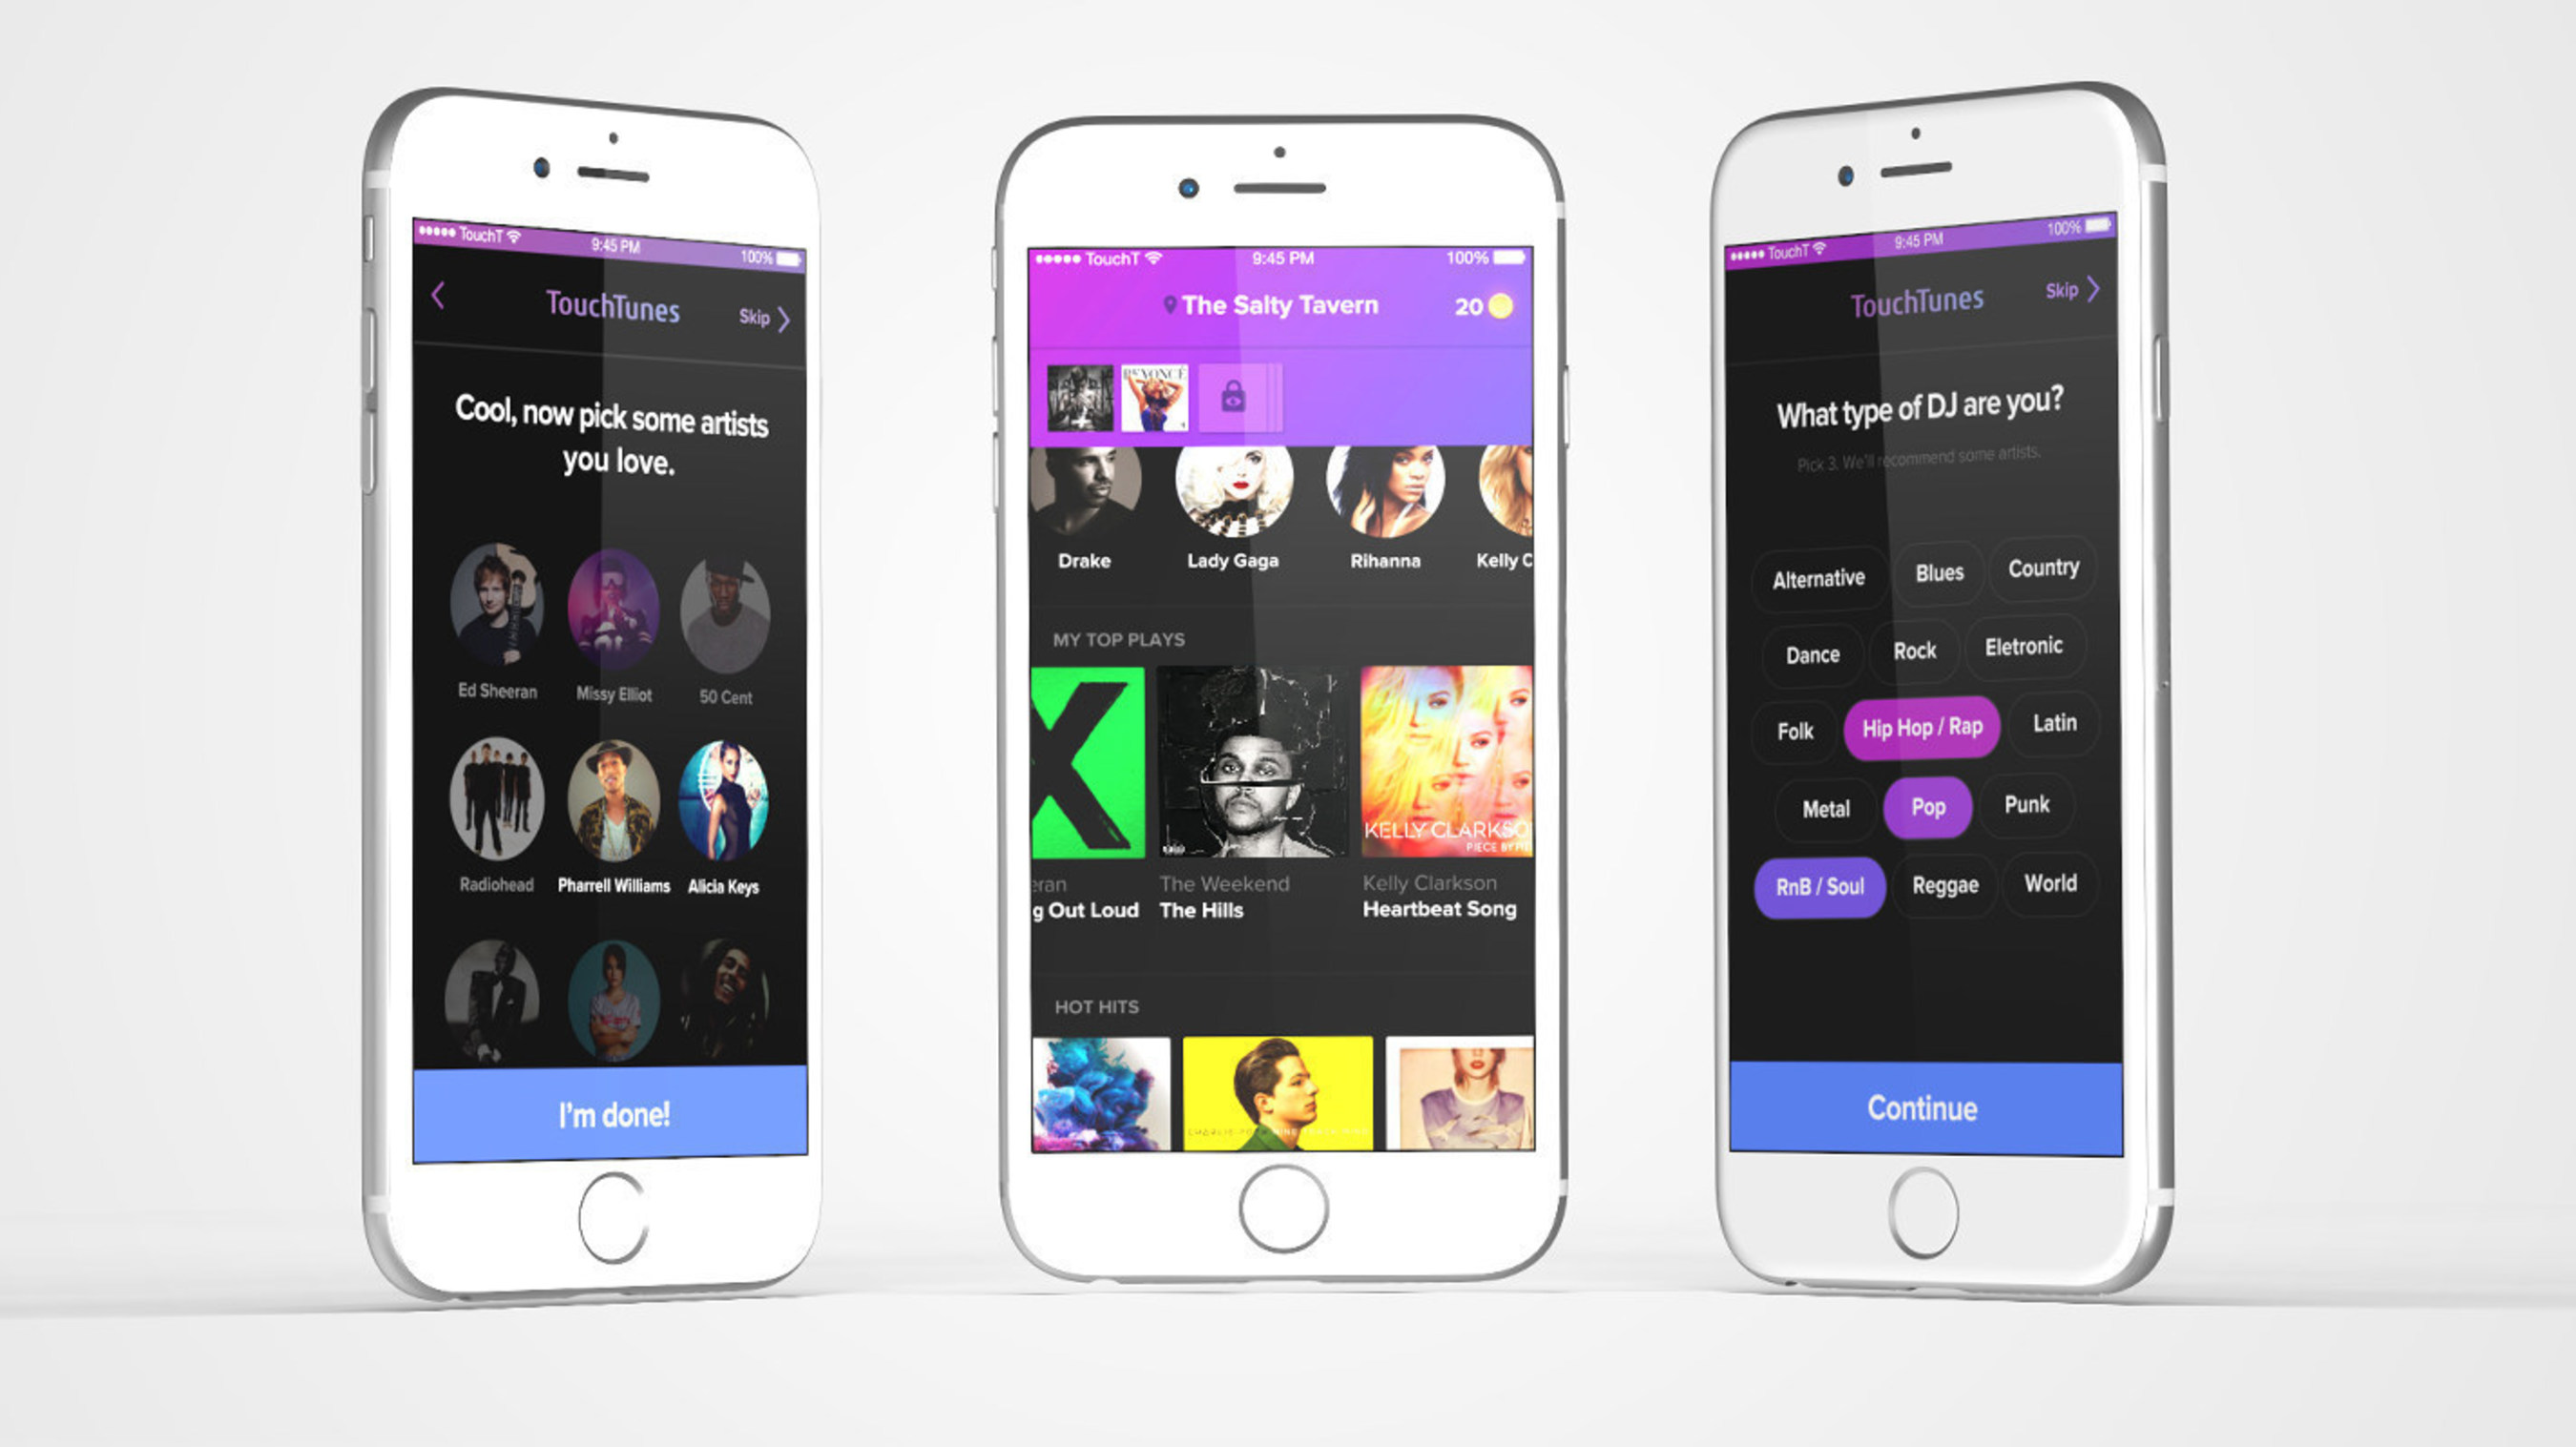 TouchTunes' Next-Generation Mobile App Now Available